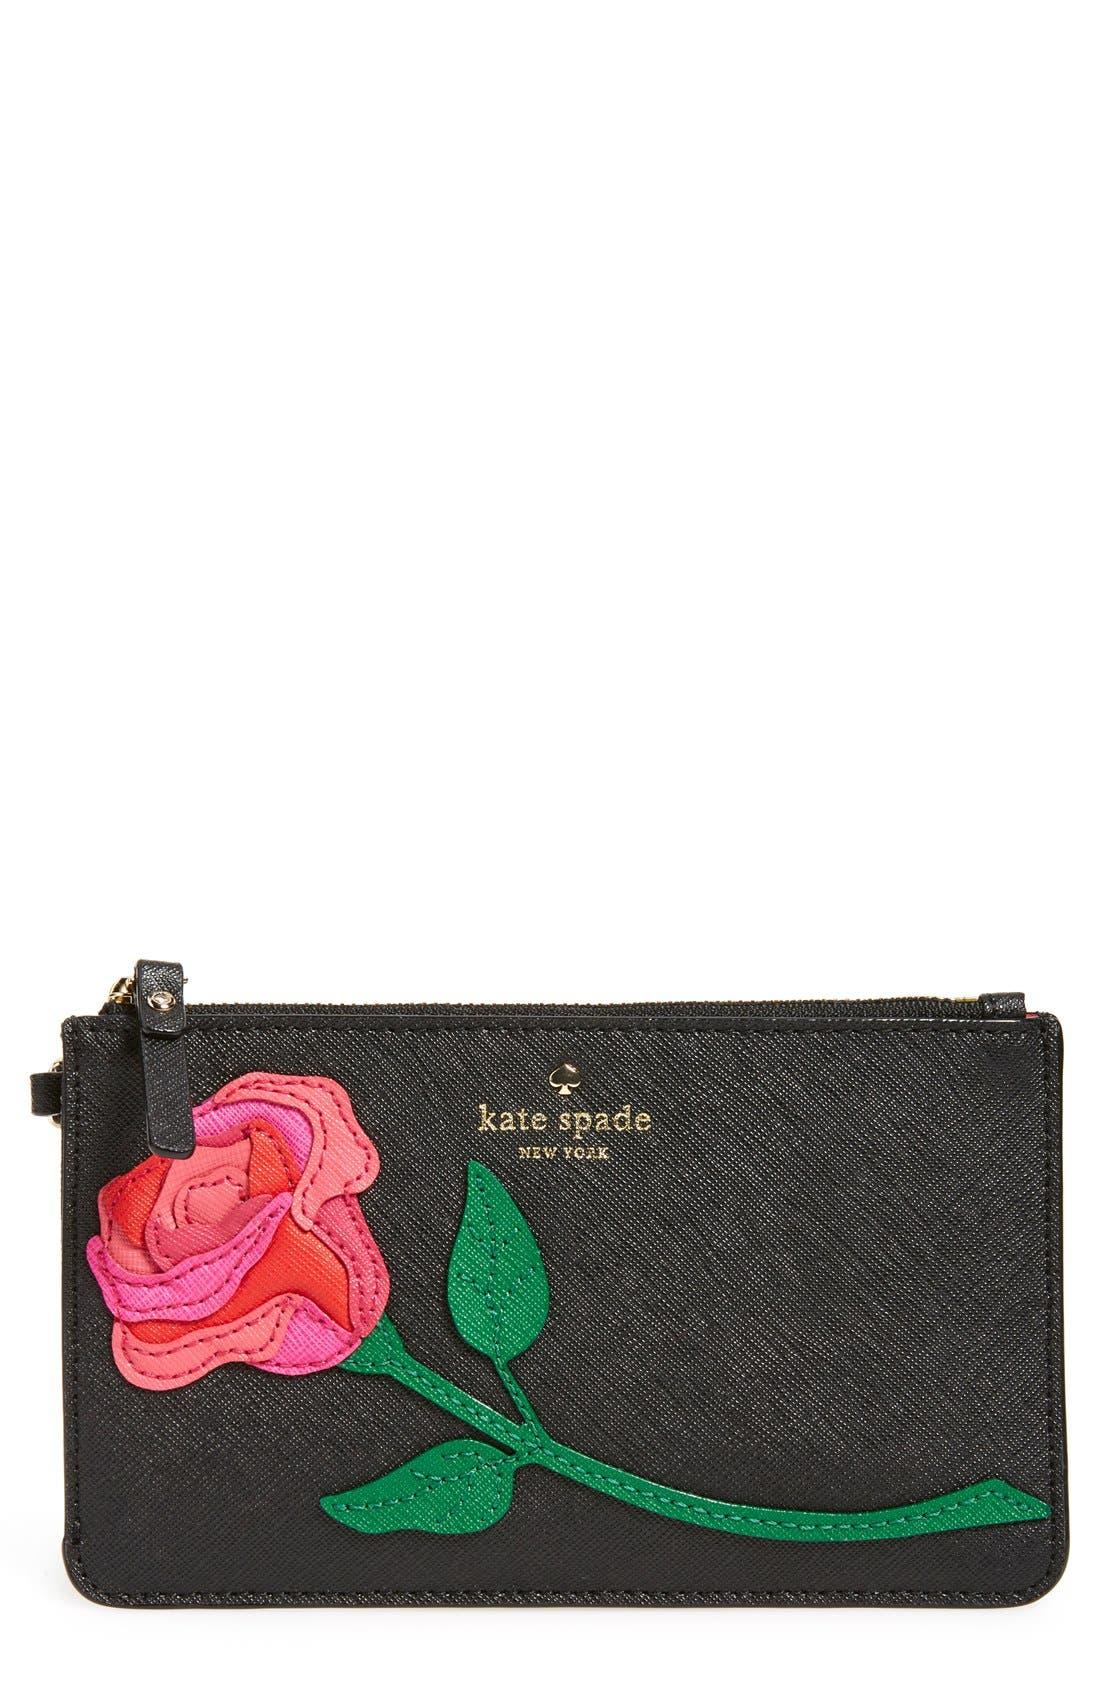 Alternate Image 1 Selected - kate spade new york 'rose appliqué - slim bee' wristlet